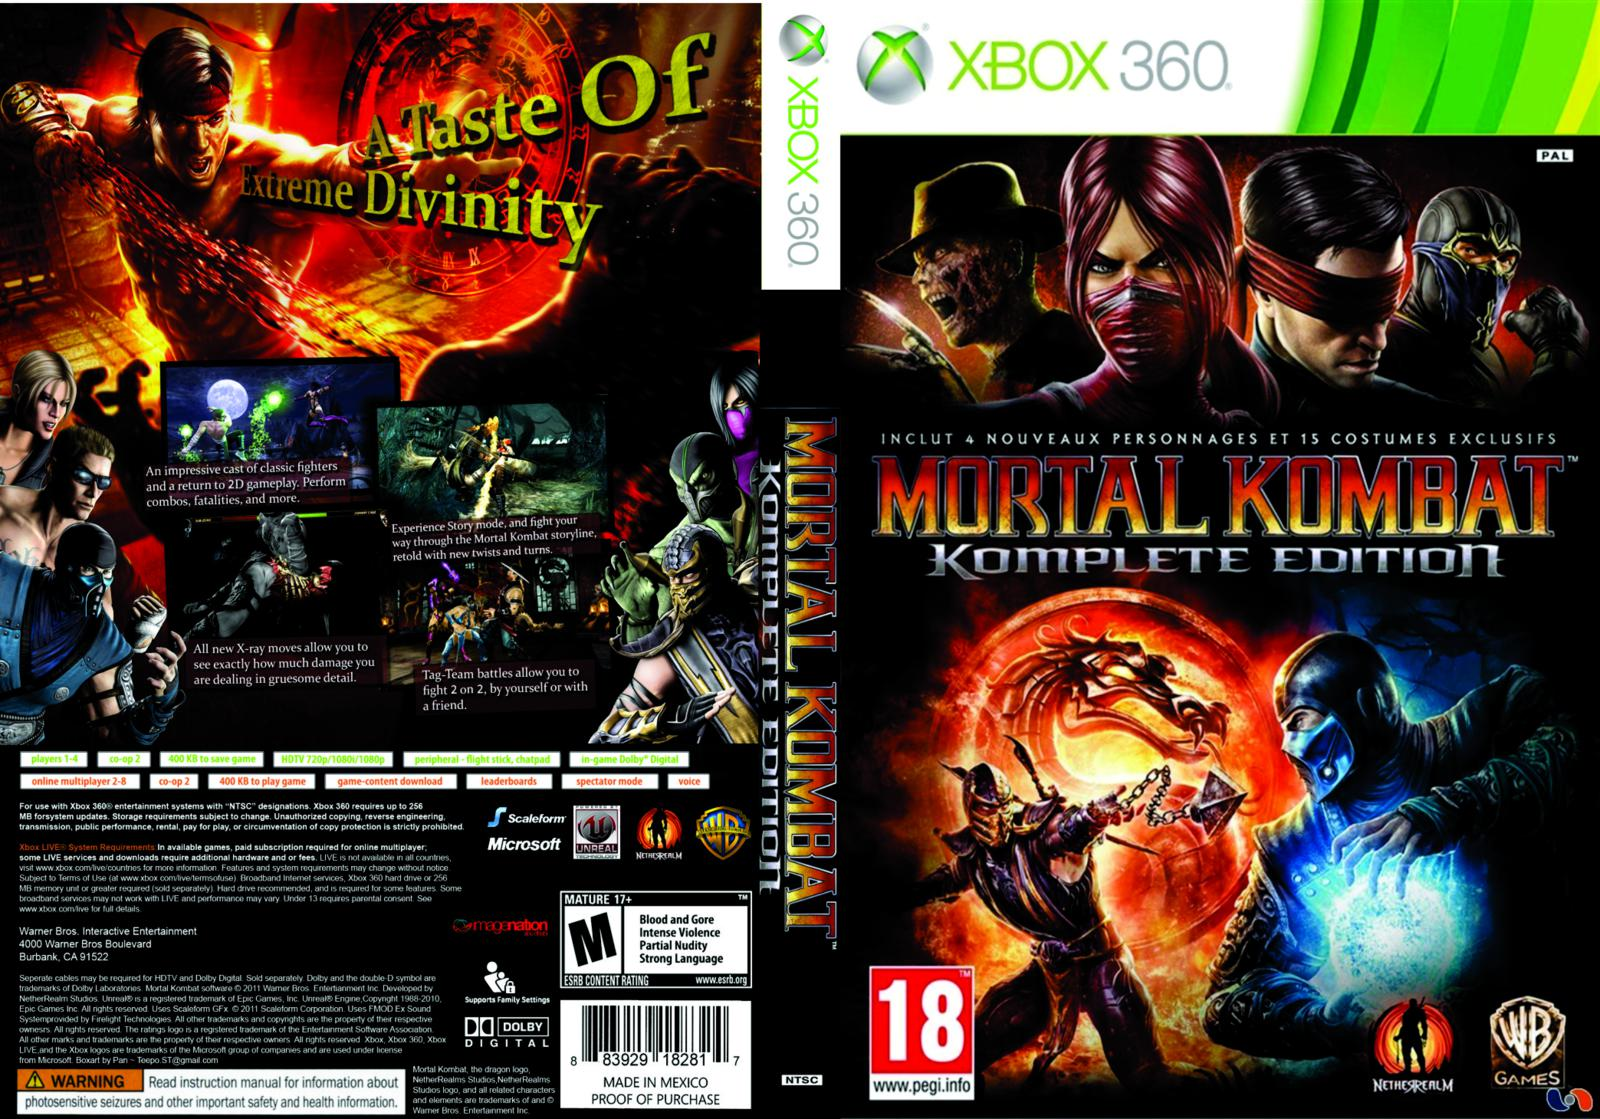 Mortal kombat komplete edition nudity xxx images